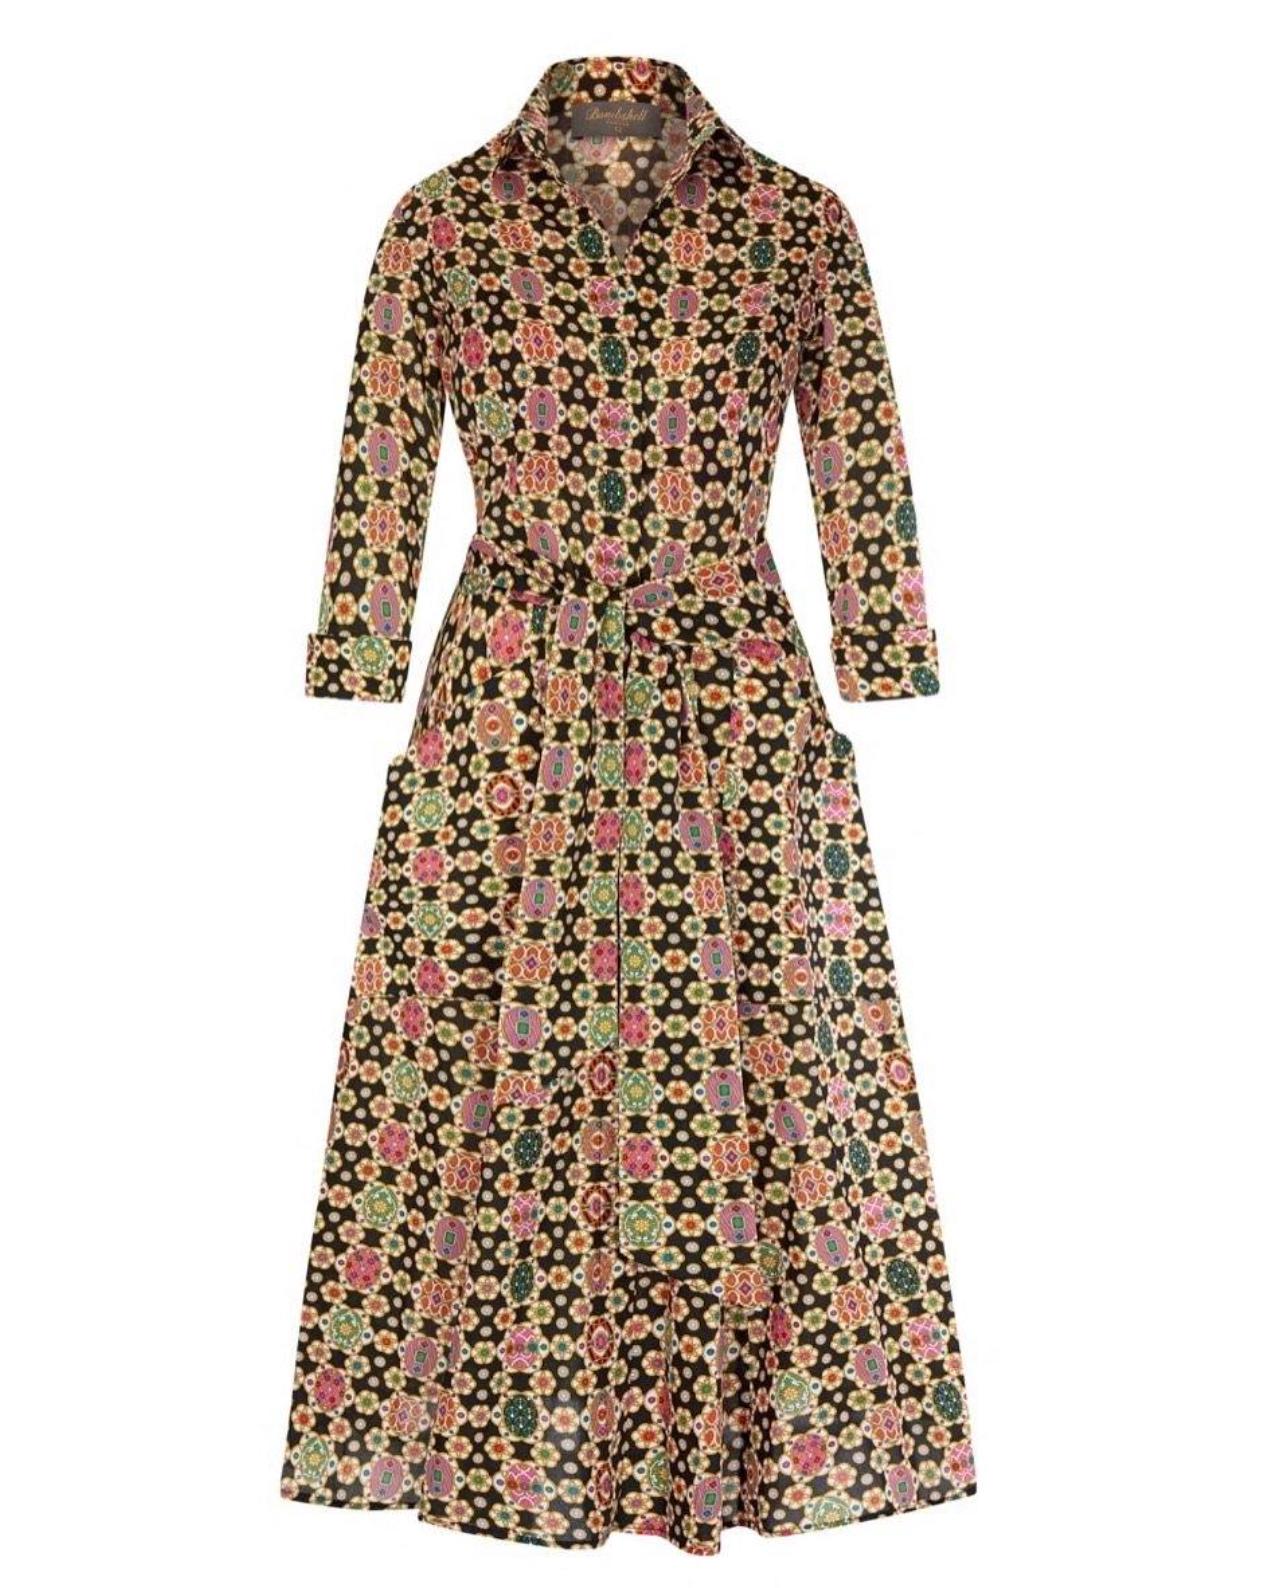 Liberty print big tummy concealing dress